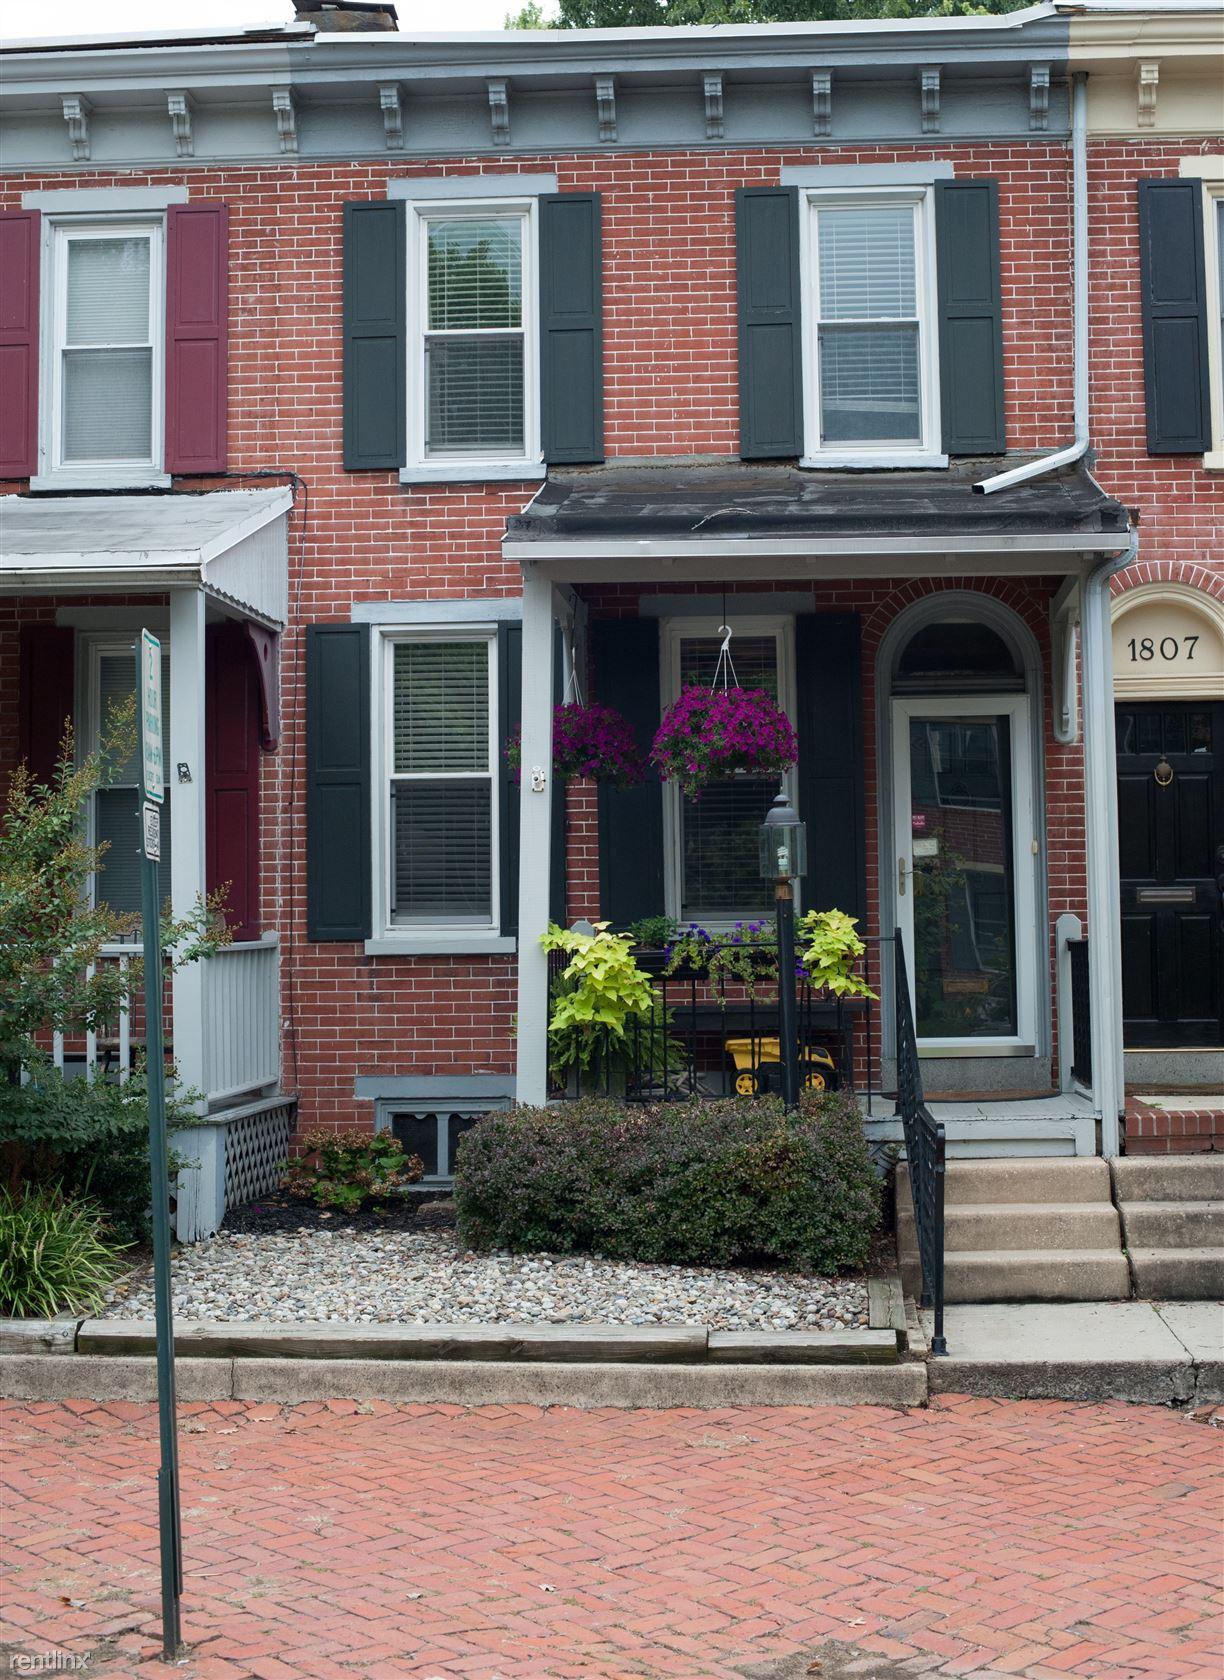 1809 Lovering Ave, Wilmington, DE - $1,750